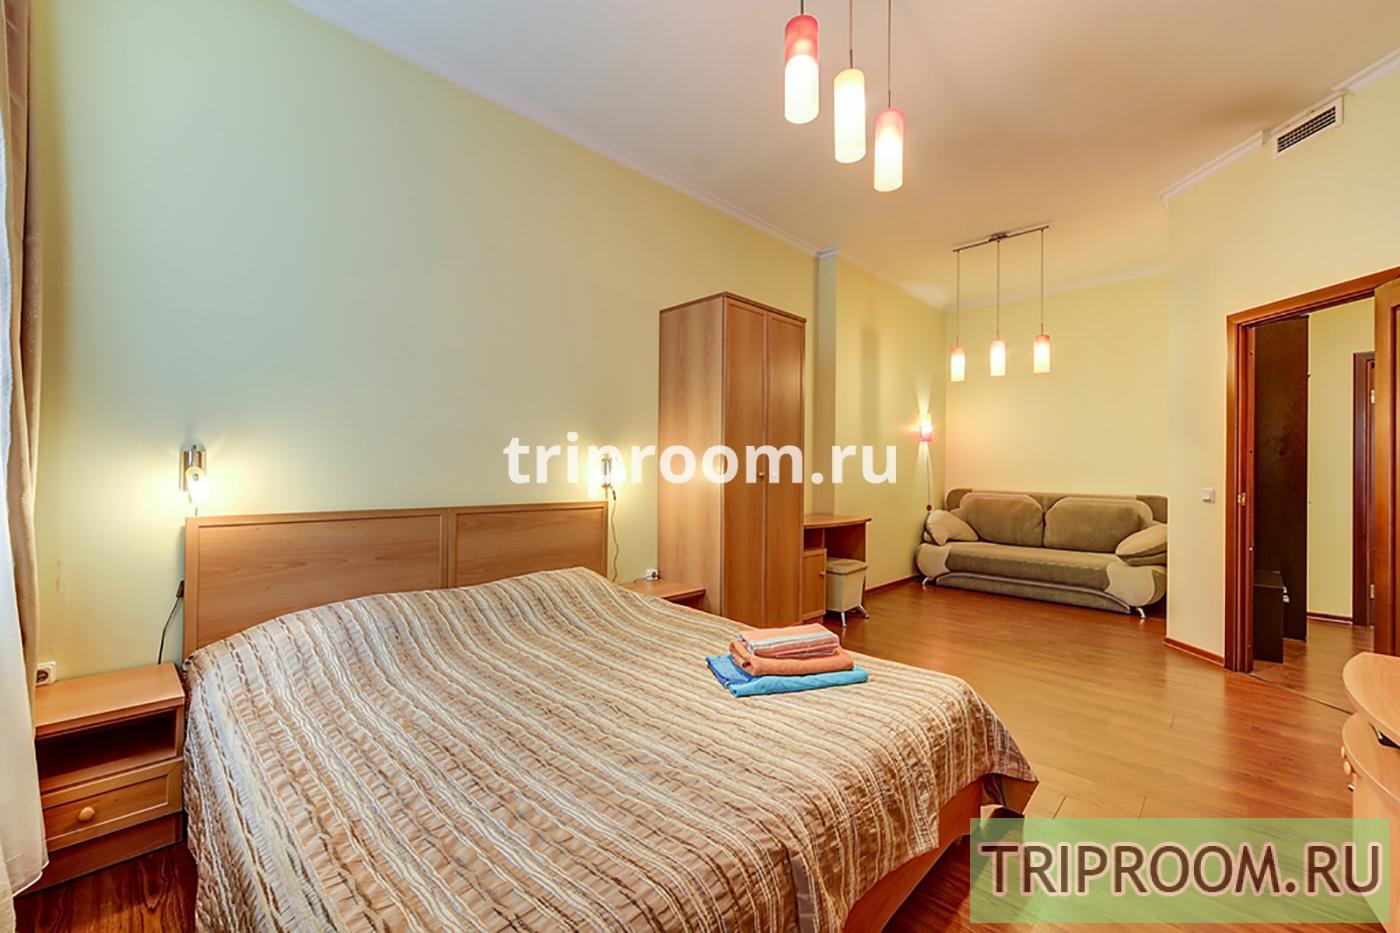 1-комнатная квартира посуточно (вариант № 15527), ул. Канала Грибоедова набережная, фото № 9